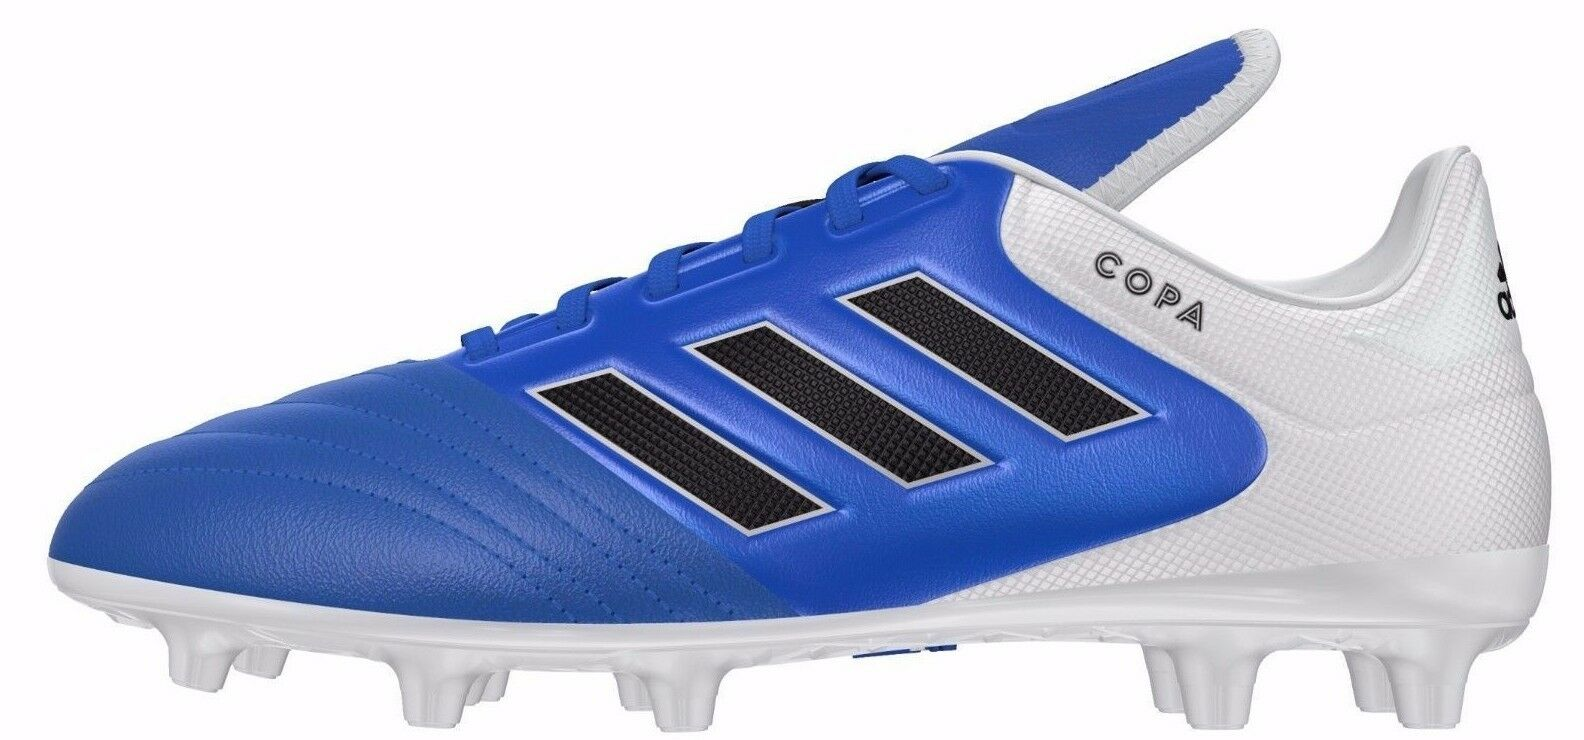 Adidas copa 17.3 FG suela Soquí levas ba9717 blancoo-azul-negro